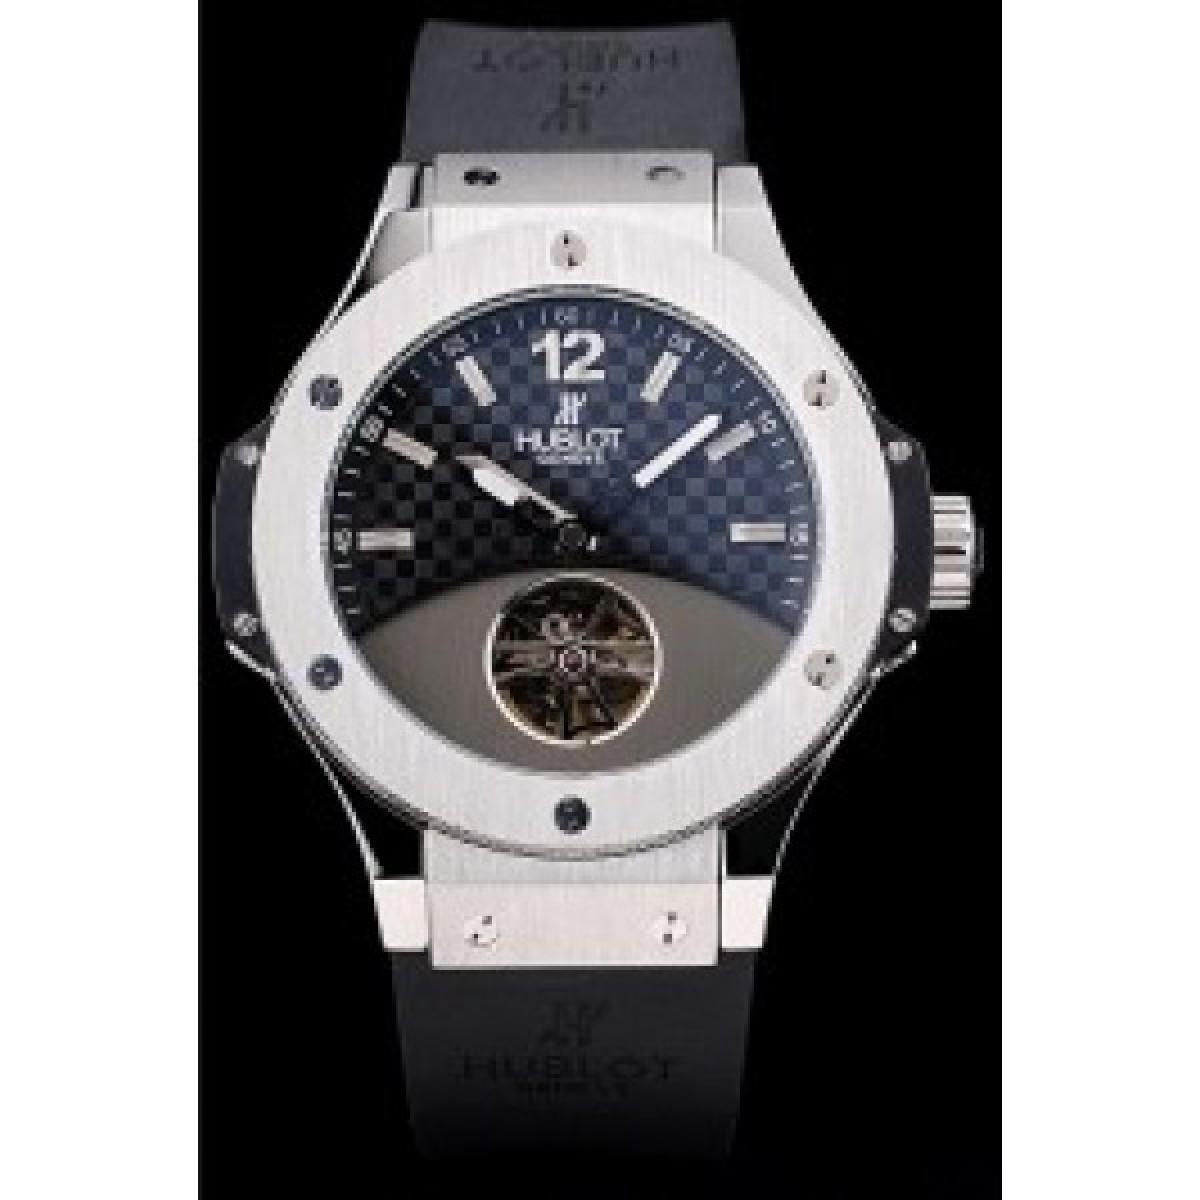 853dfc33bd1 Relógio Réplica Hublot Big Bang Luneta